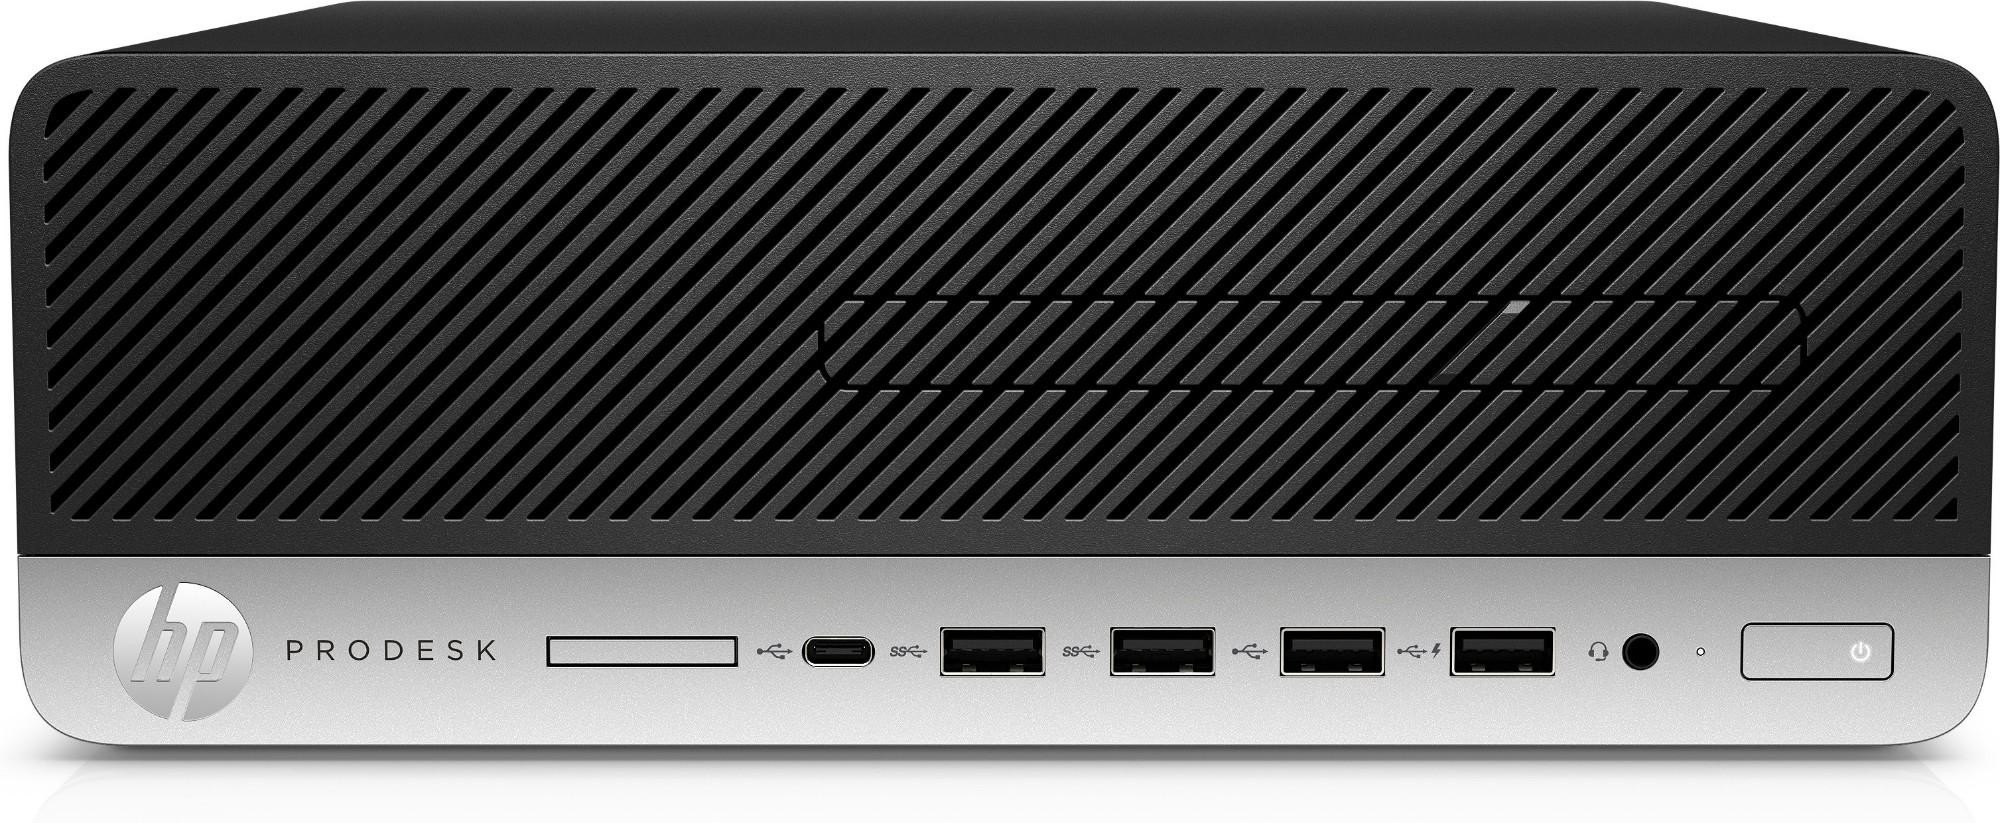 ProDesk 600 G3 SFF - i5-7500 - 8GB RAM - 256GB SSD - DVD - Win10 Pro - Qw-uk